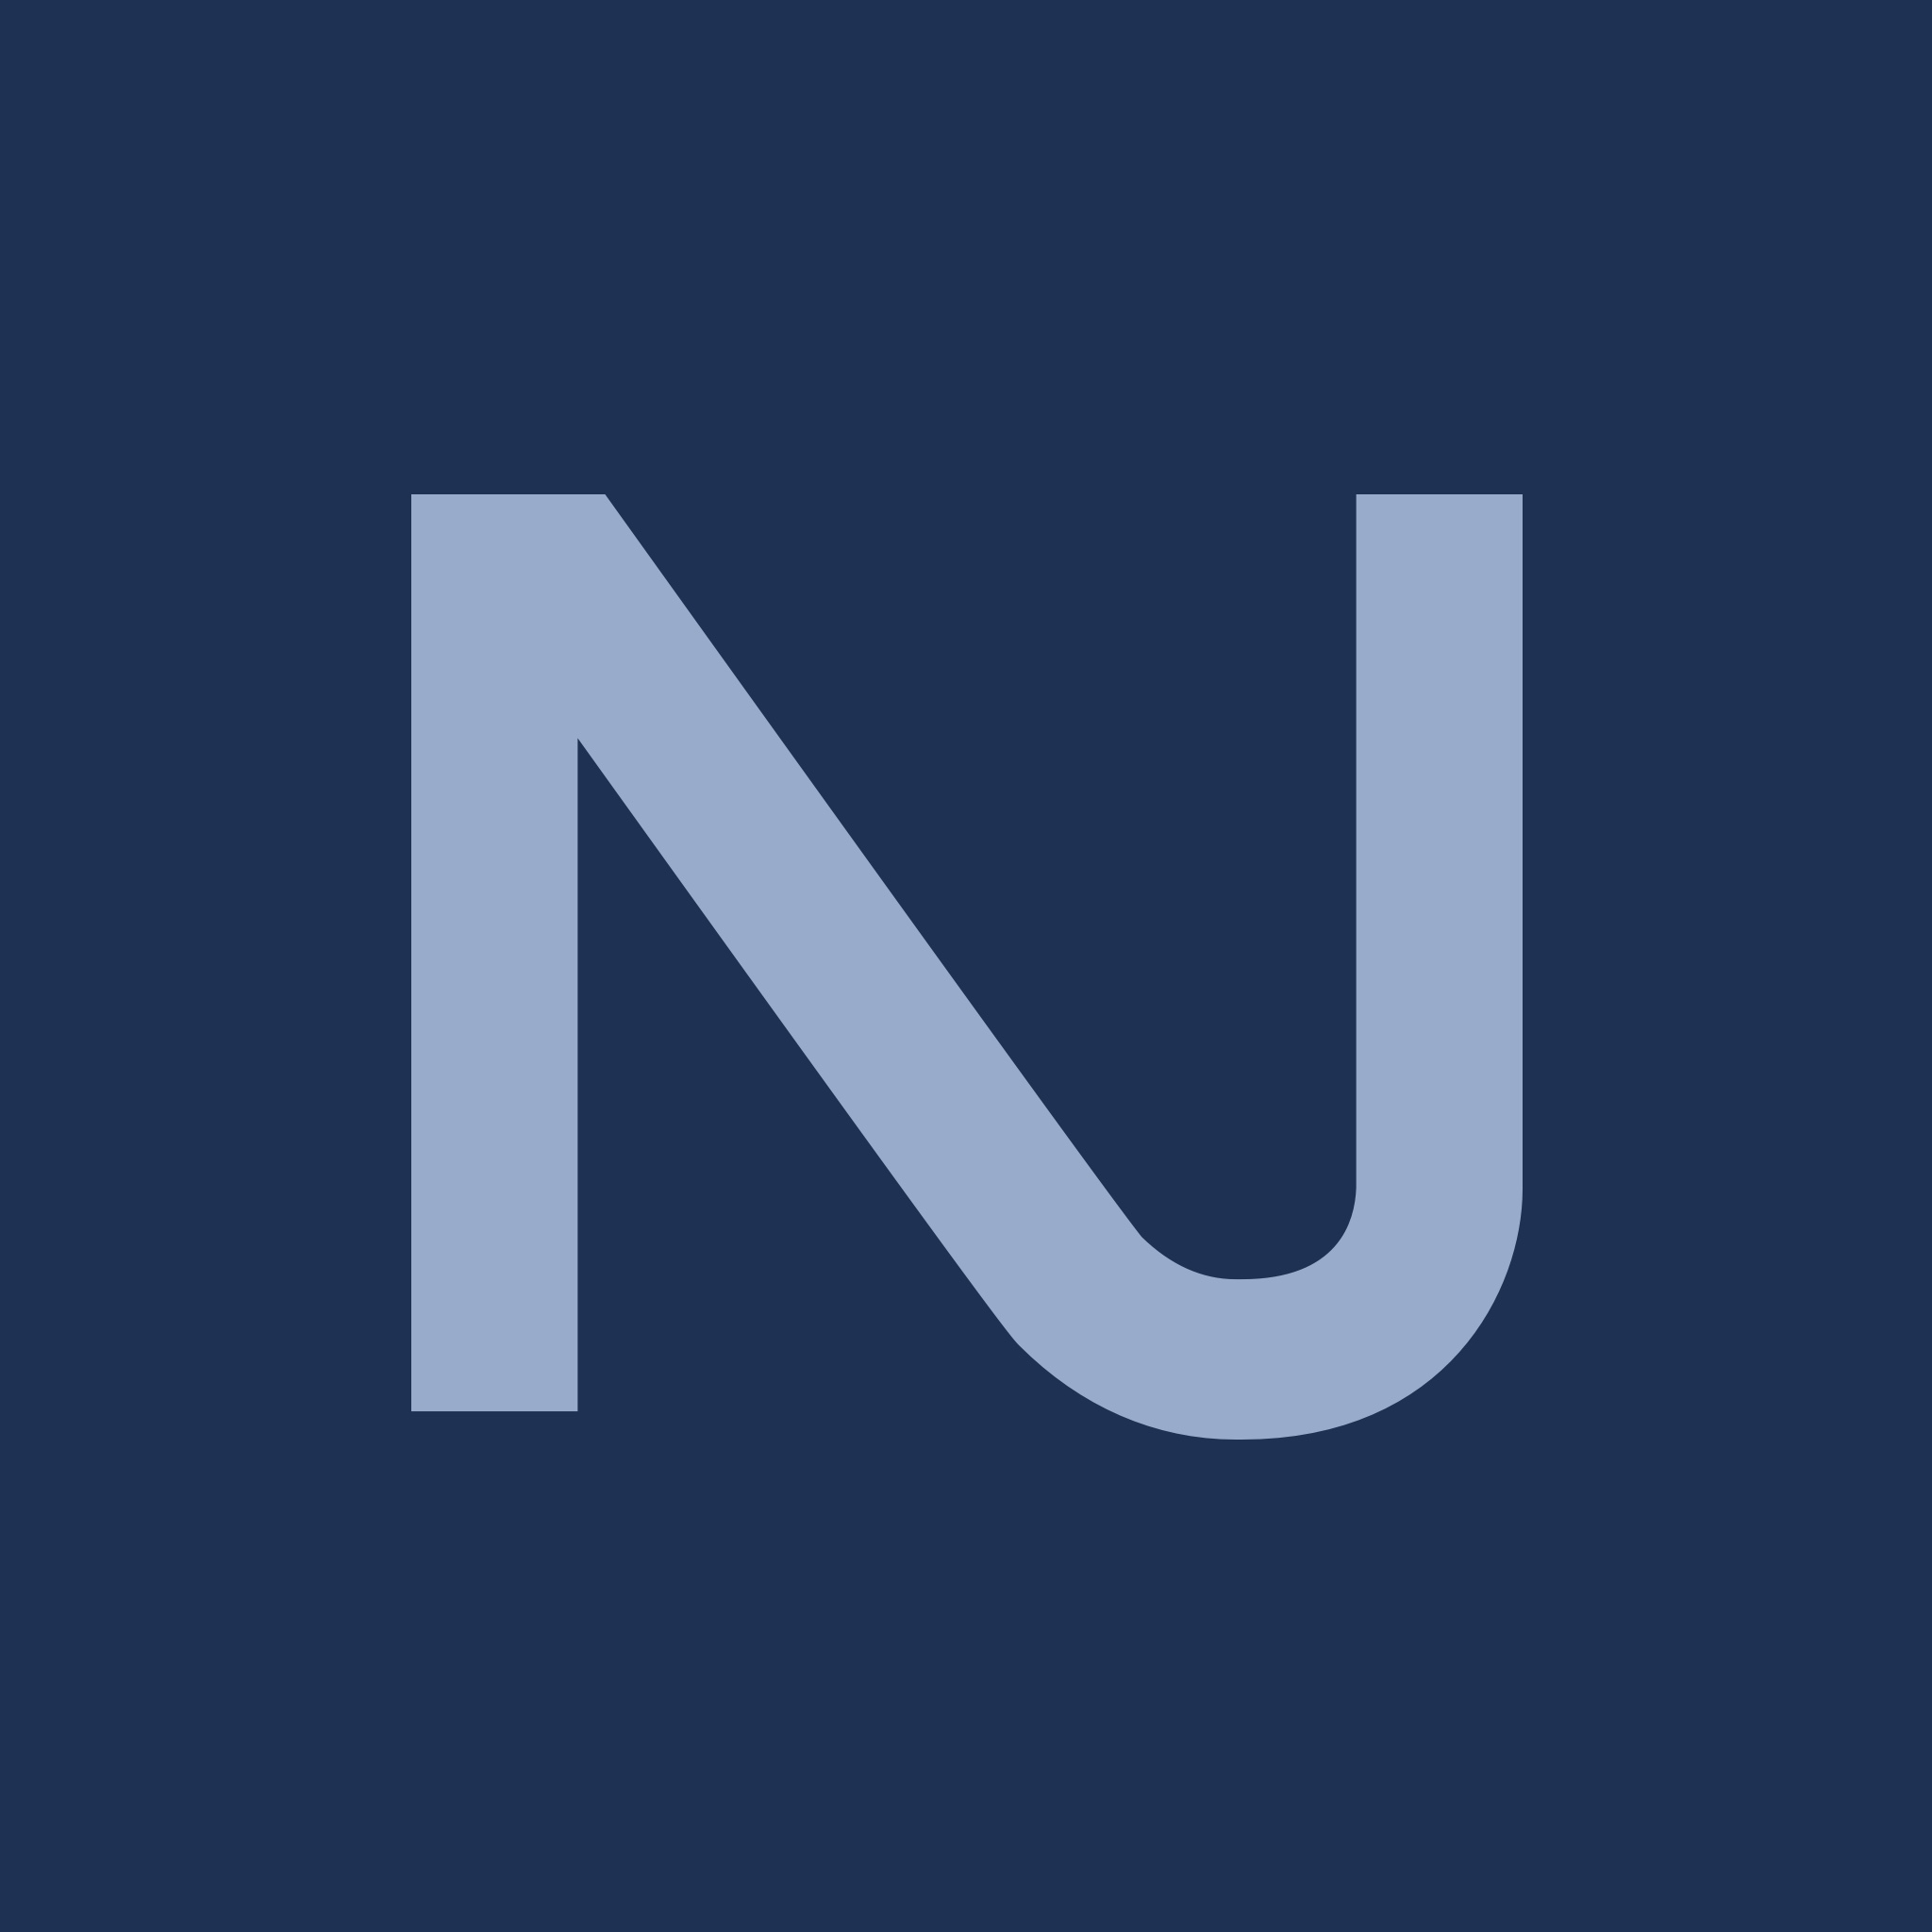 Nuvi logo